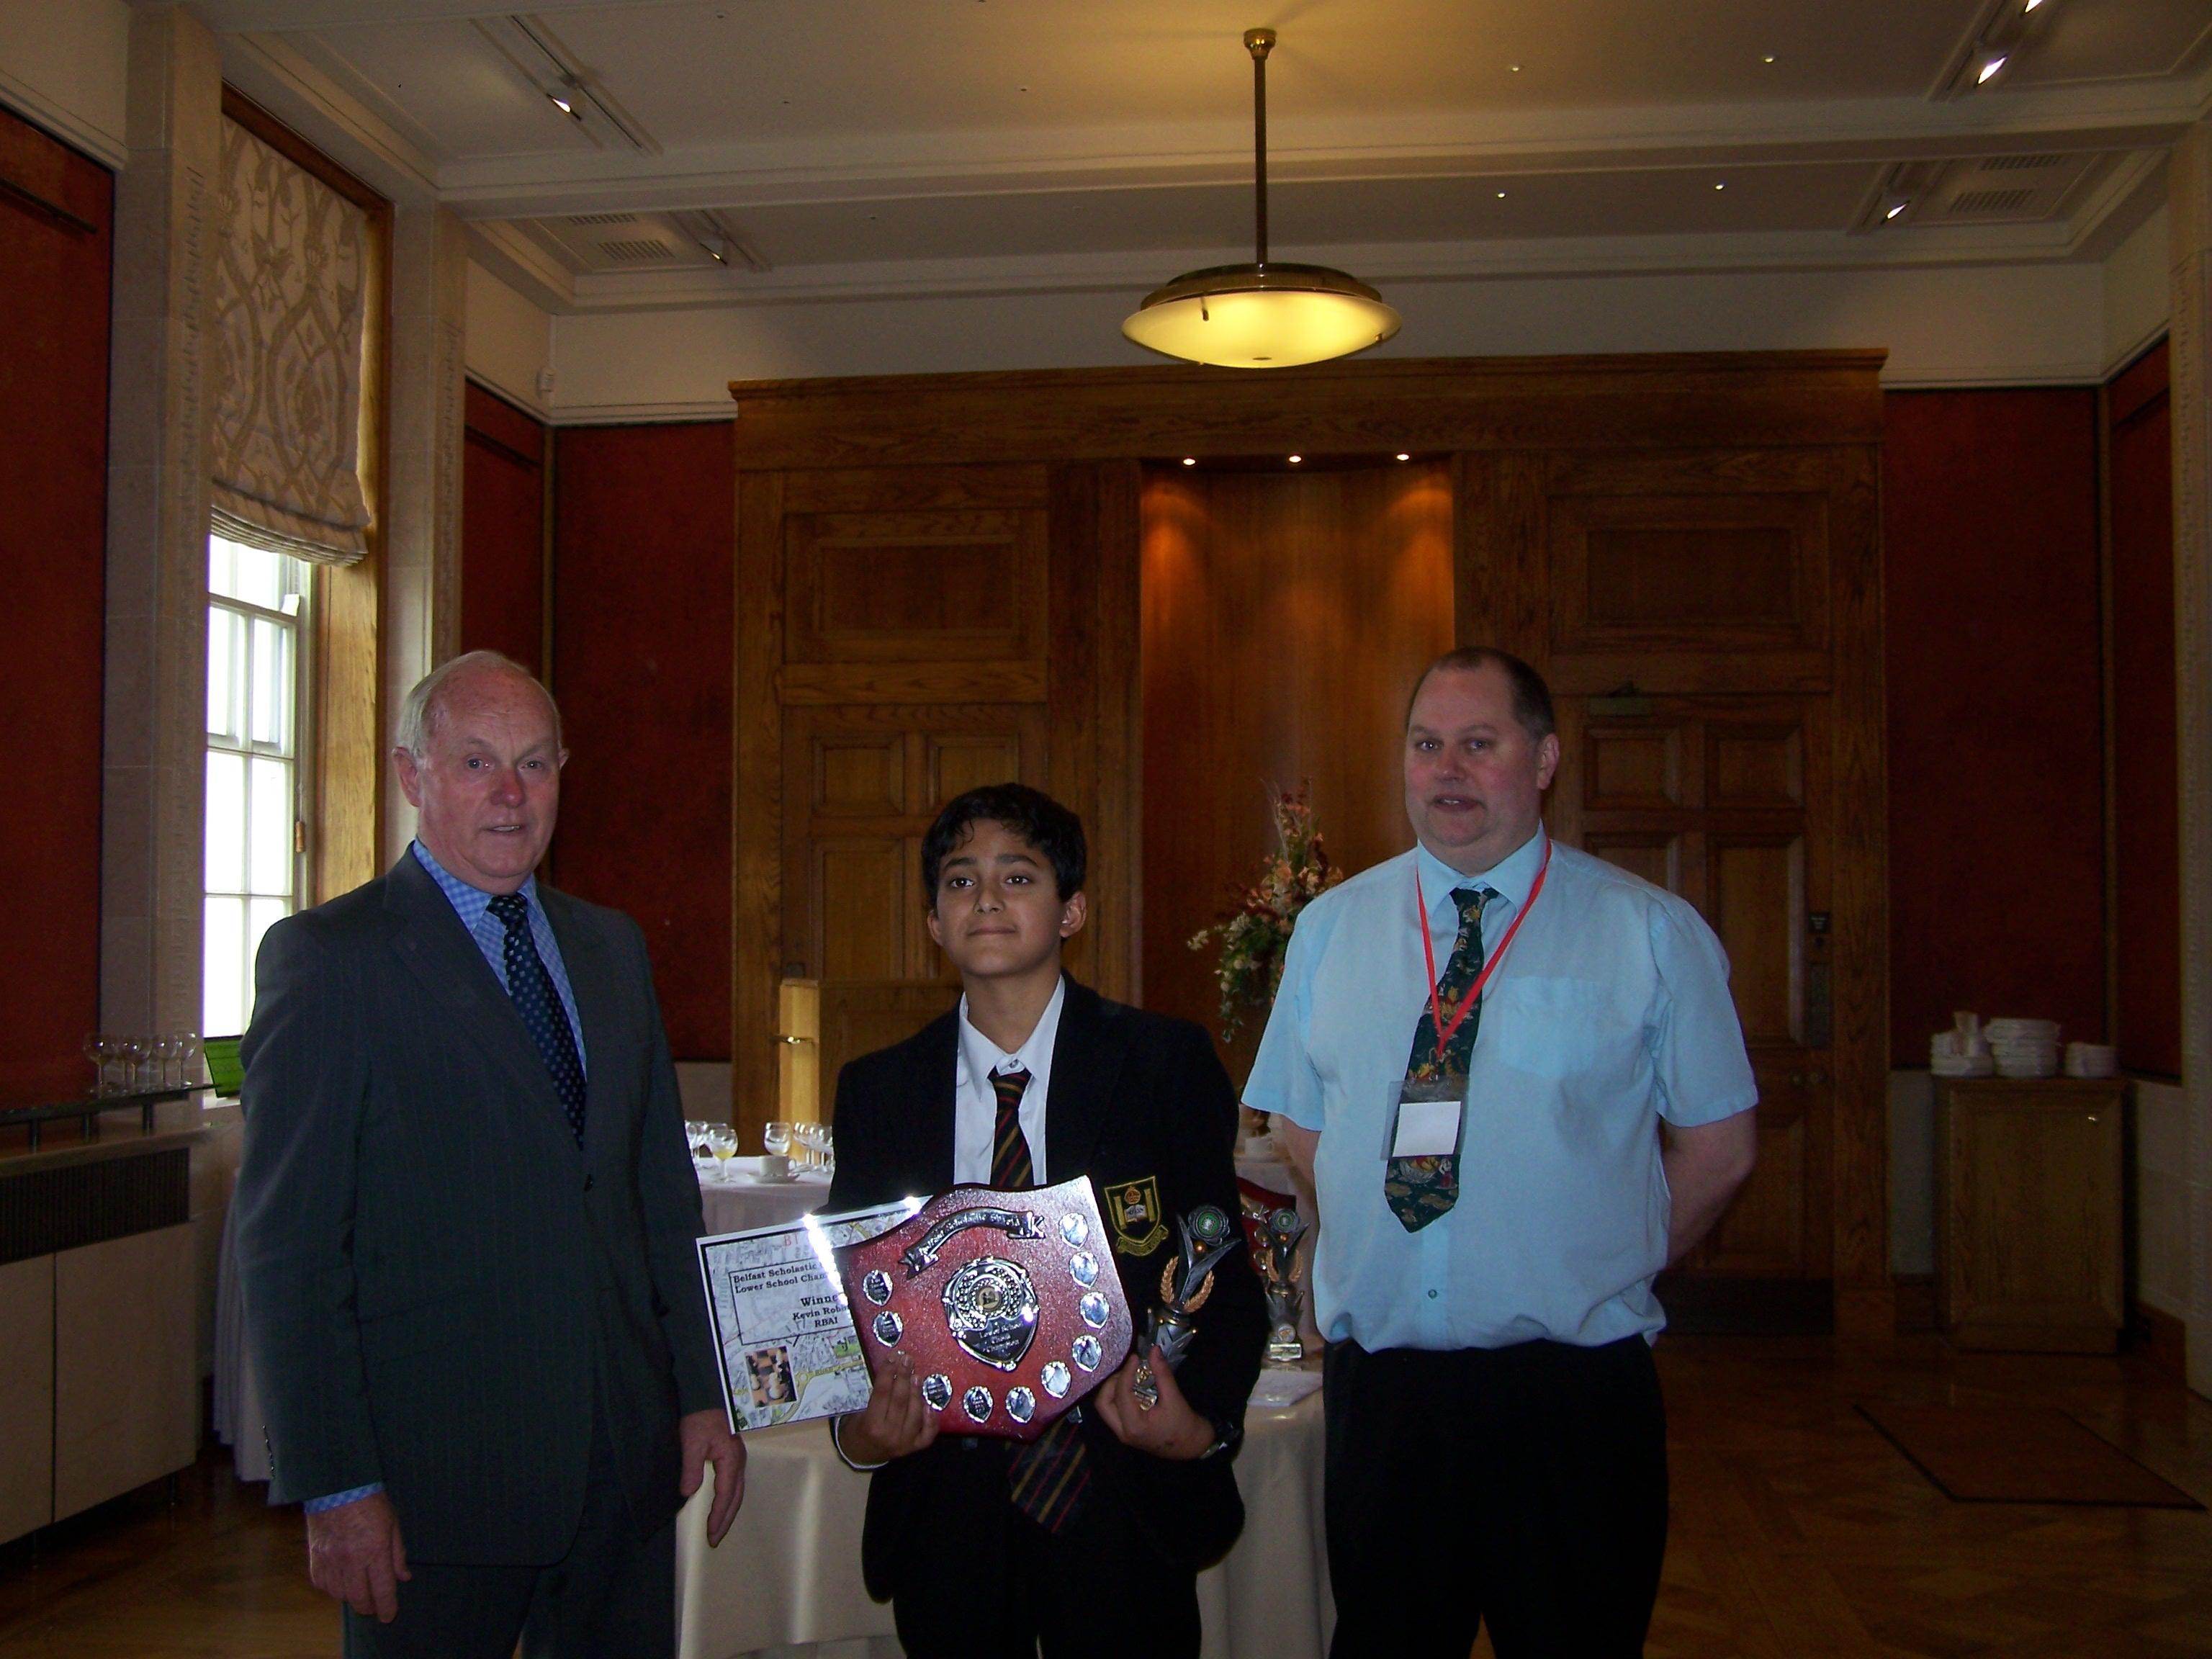 Kieran McCarthy MLA awards Kevin Robbin with winners shield